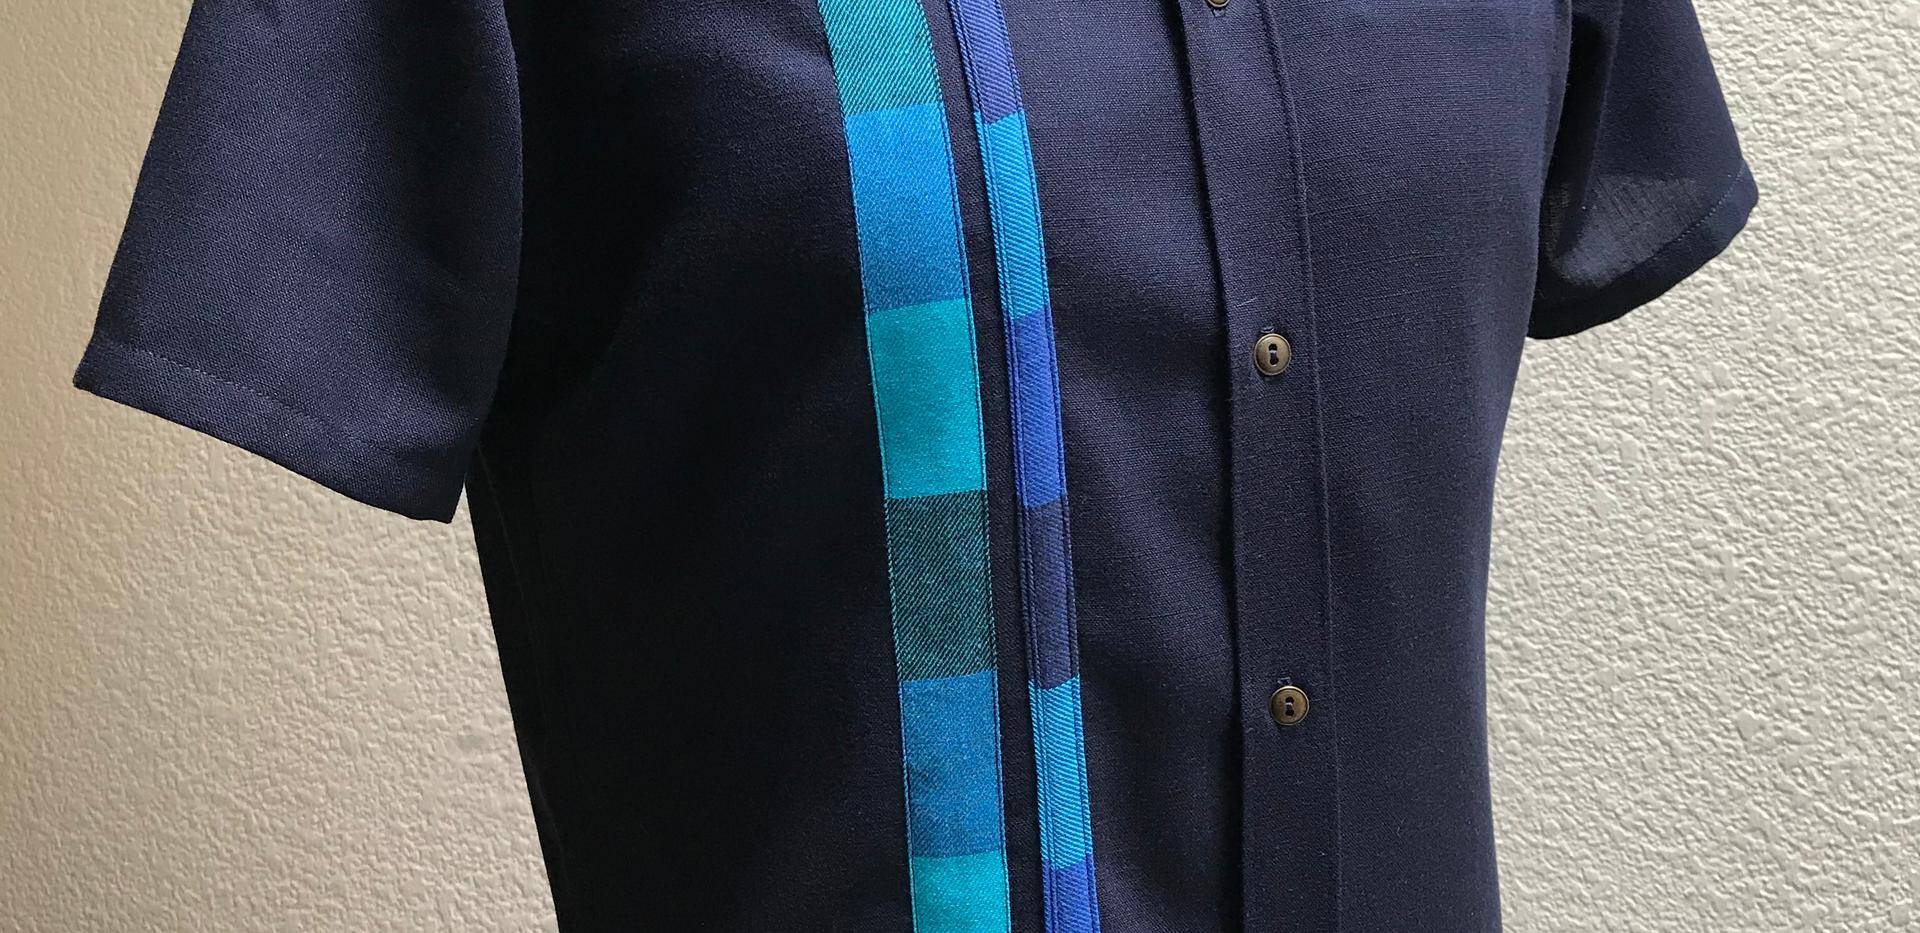 Full Button Short Sleve Shirt with Welt Pocket